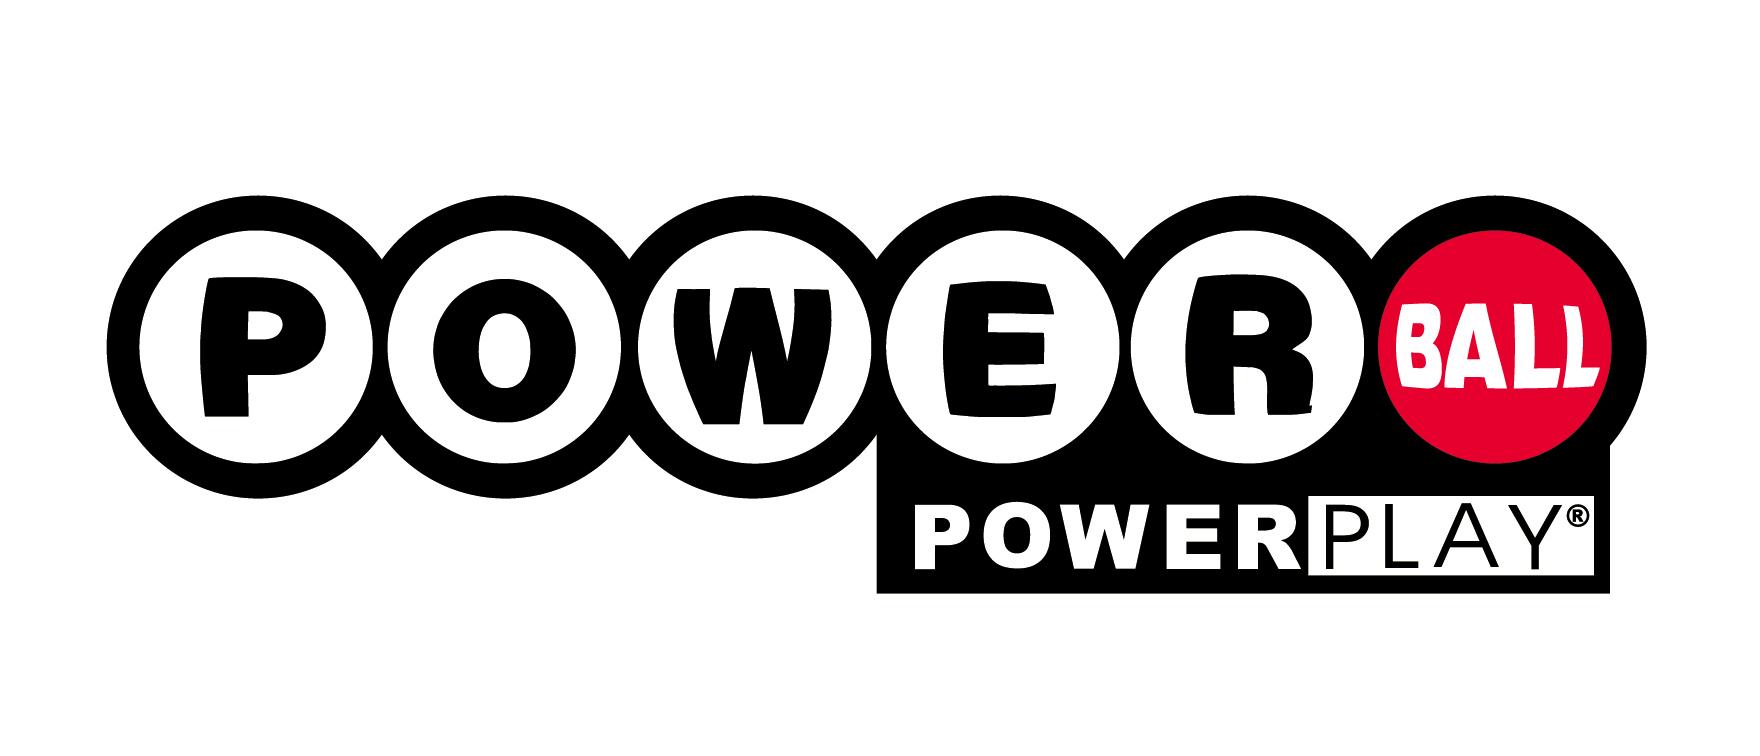 powerball logo 2021